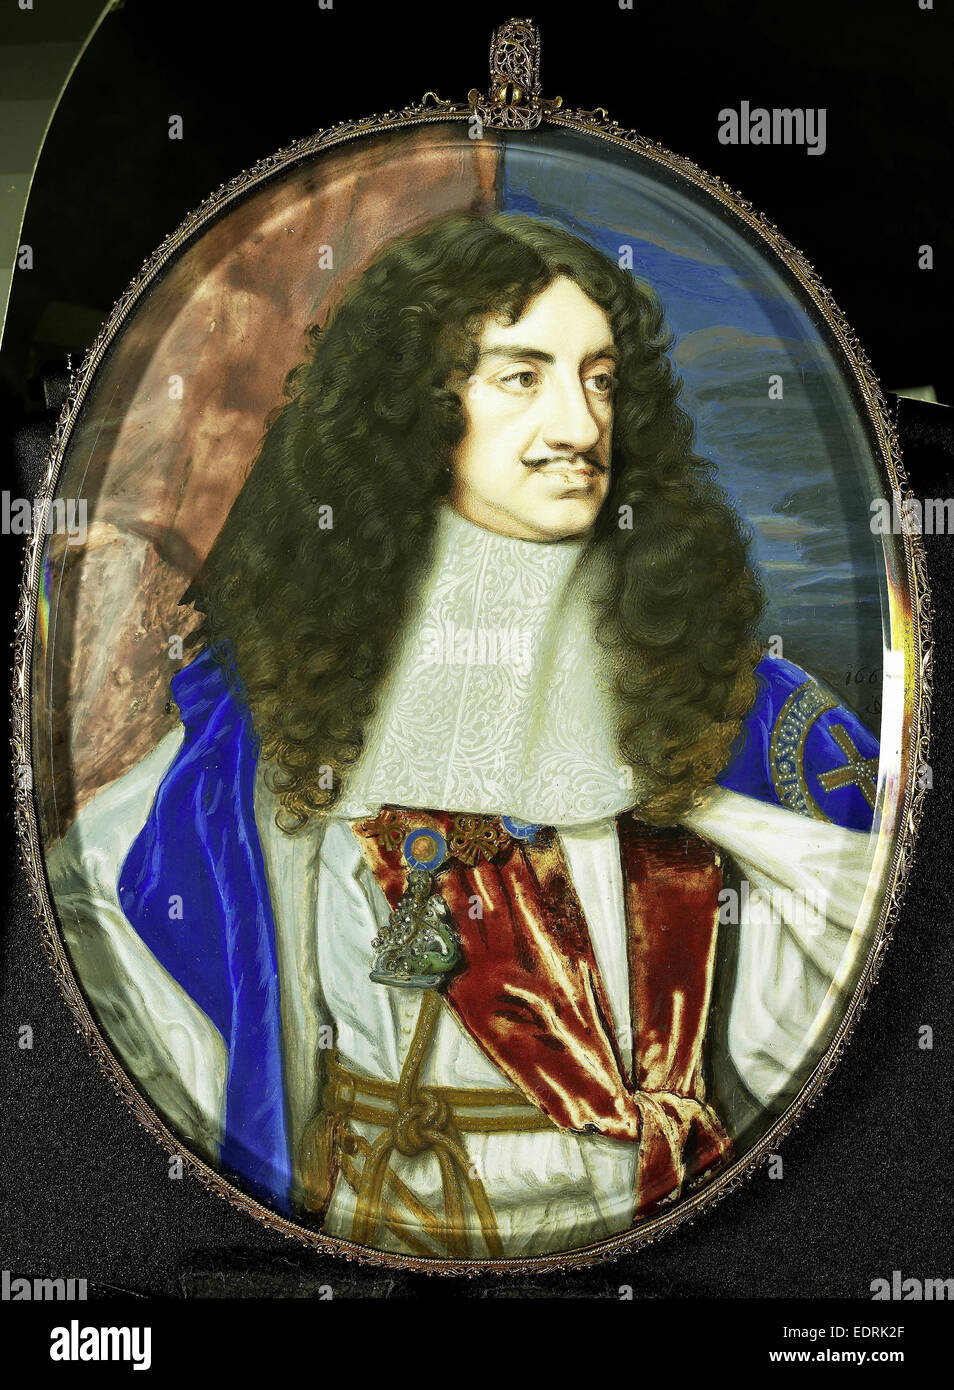 Karel II, 1630-85, king of England, Samuel Cooper, 1665, Portrait miniature - Stock Image